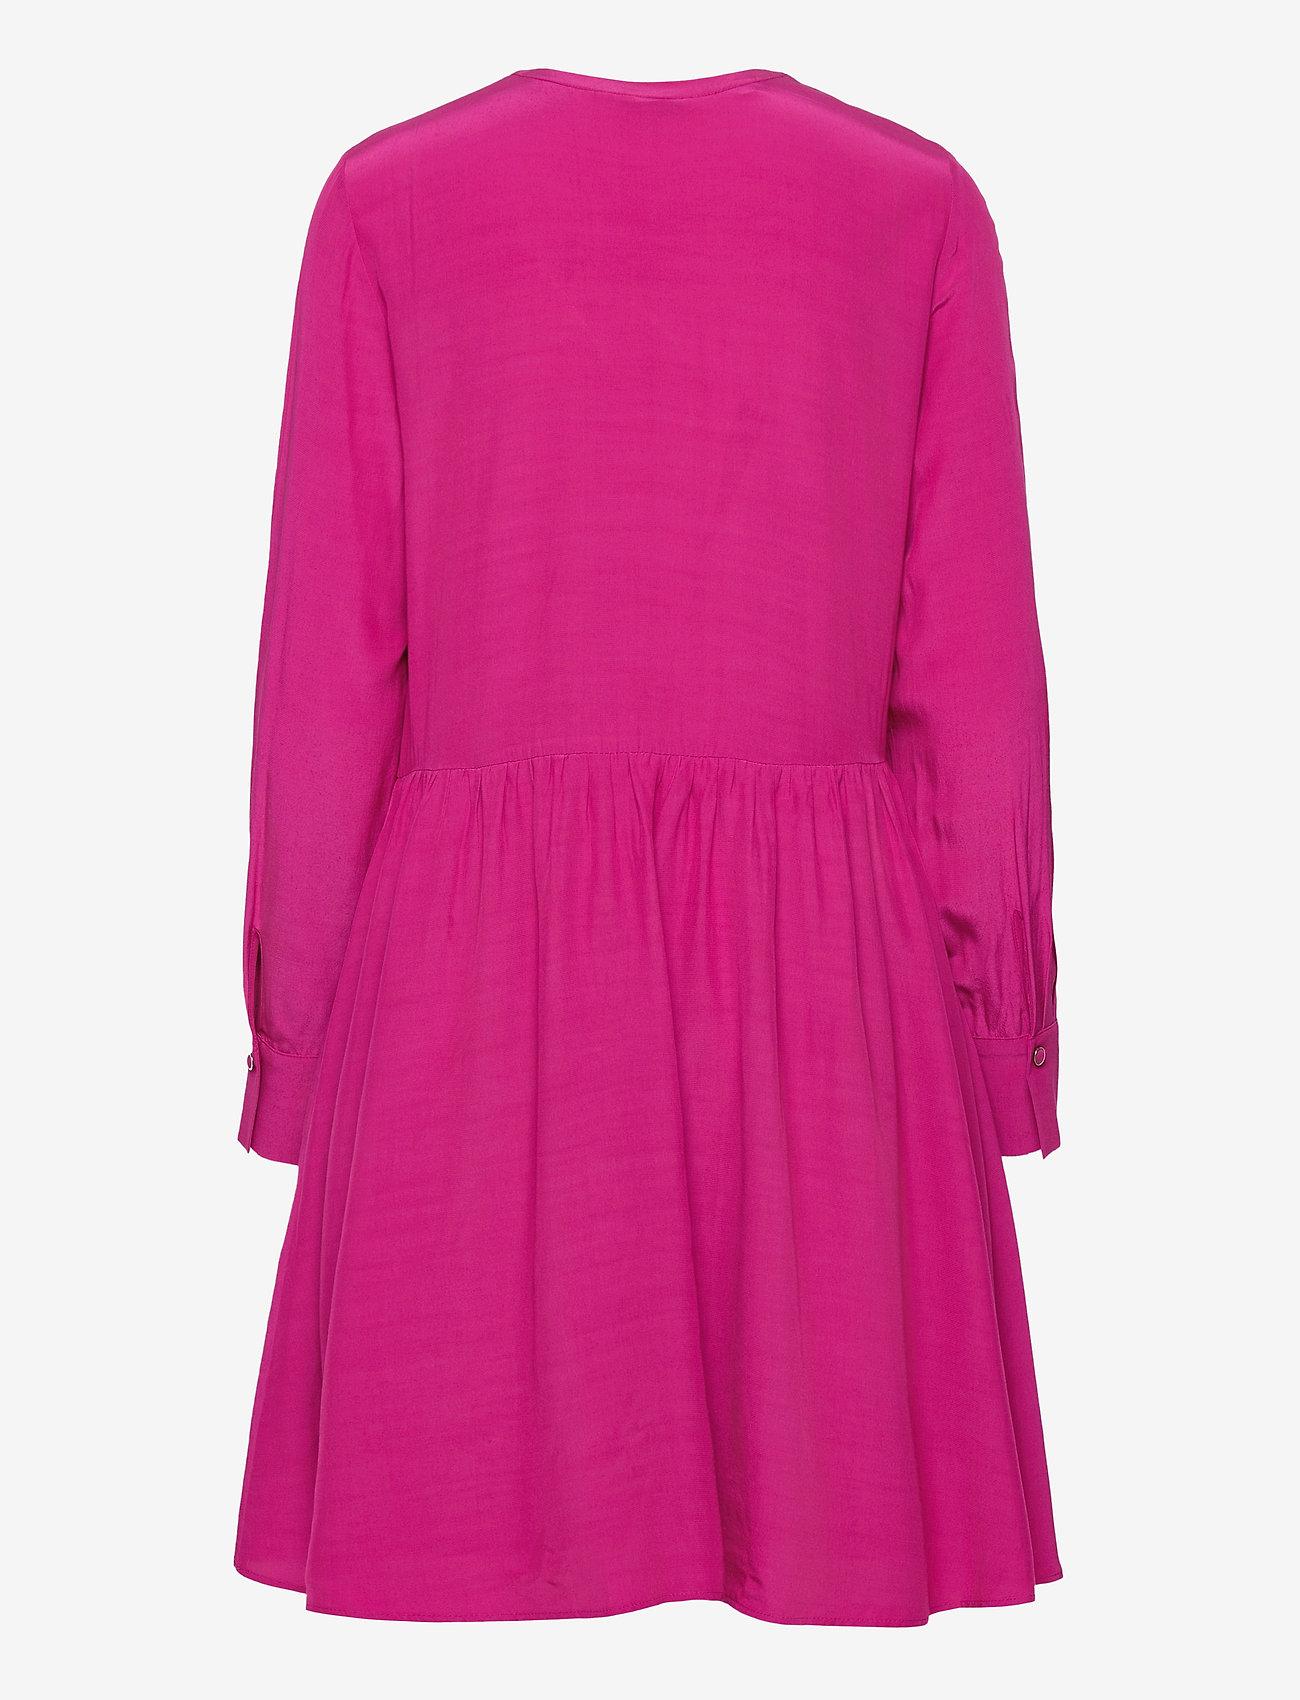 Tommy Hilfiger - VISCOSE CDC ABOVE KNEE DRESS LS - alledaagse jurken - fuchsia - 1